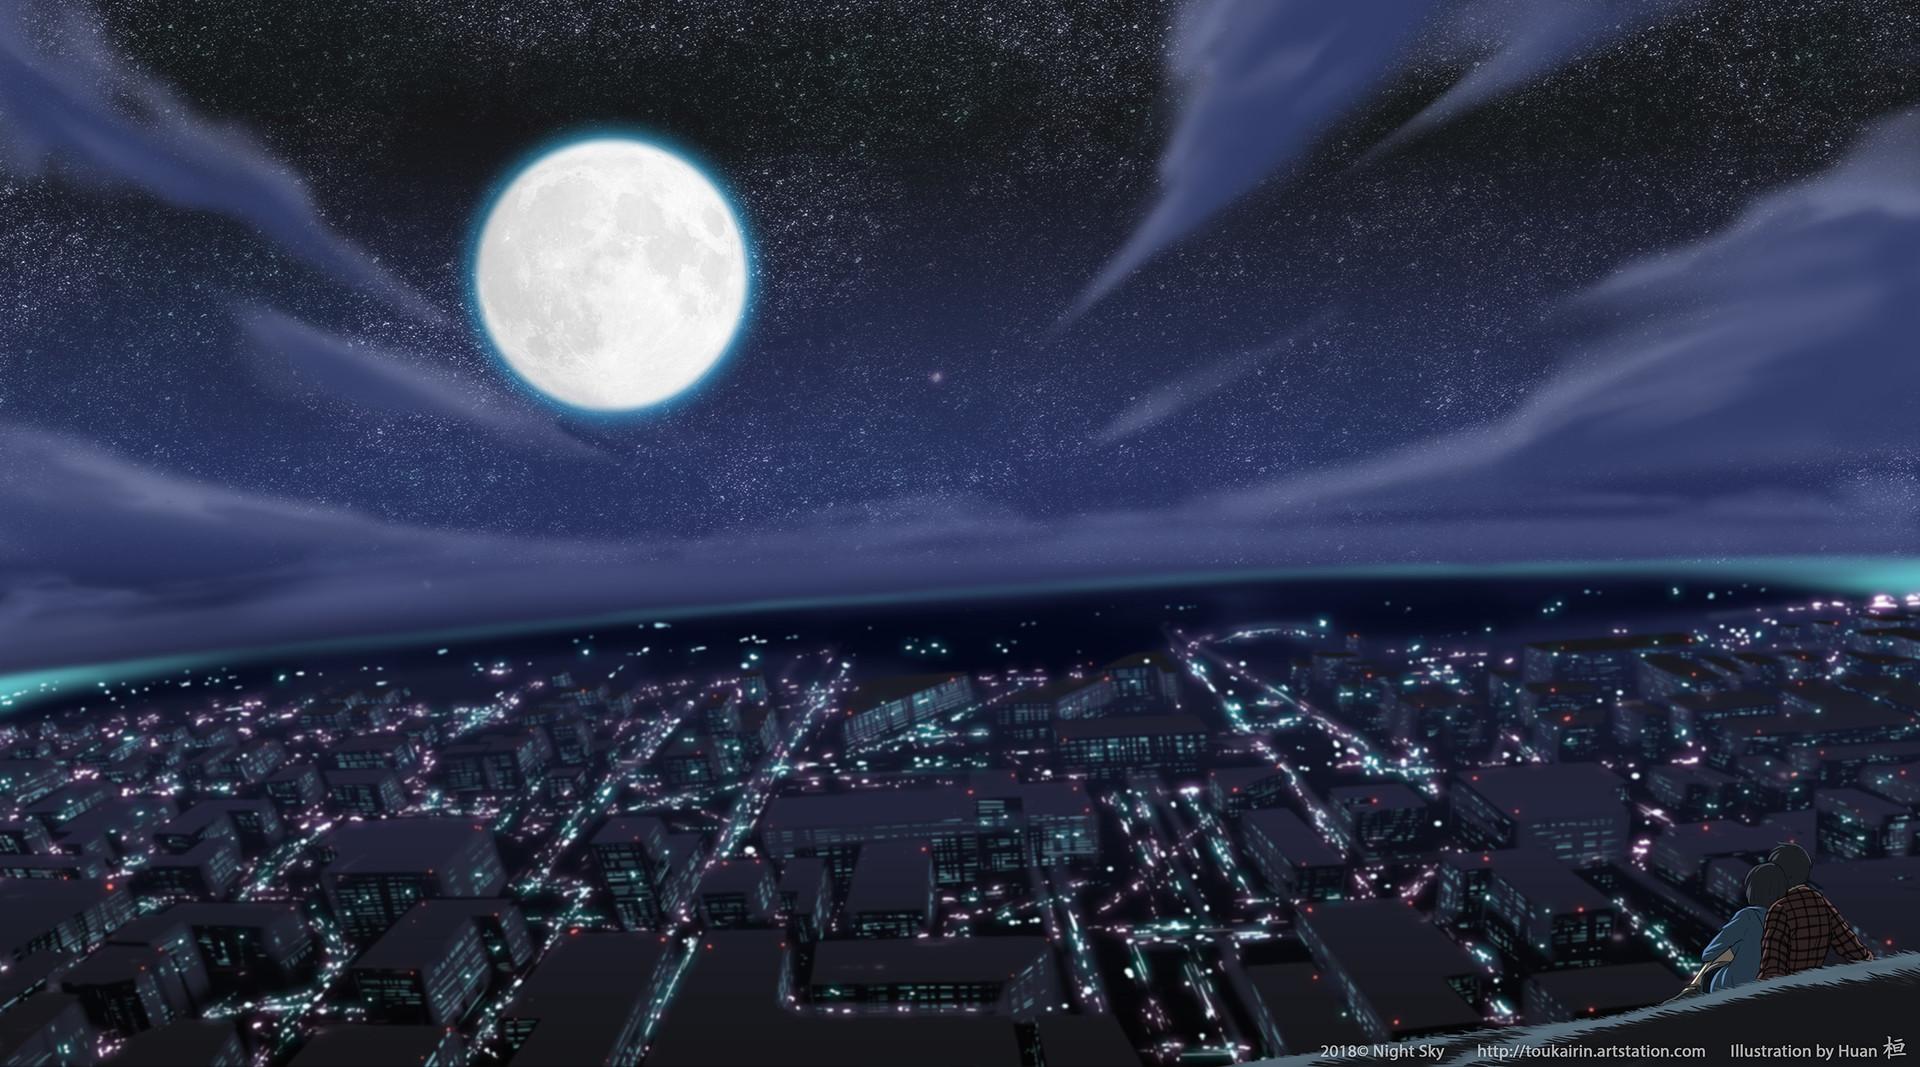 Huan lim night sky